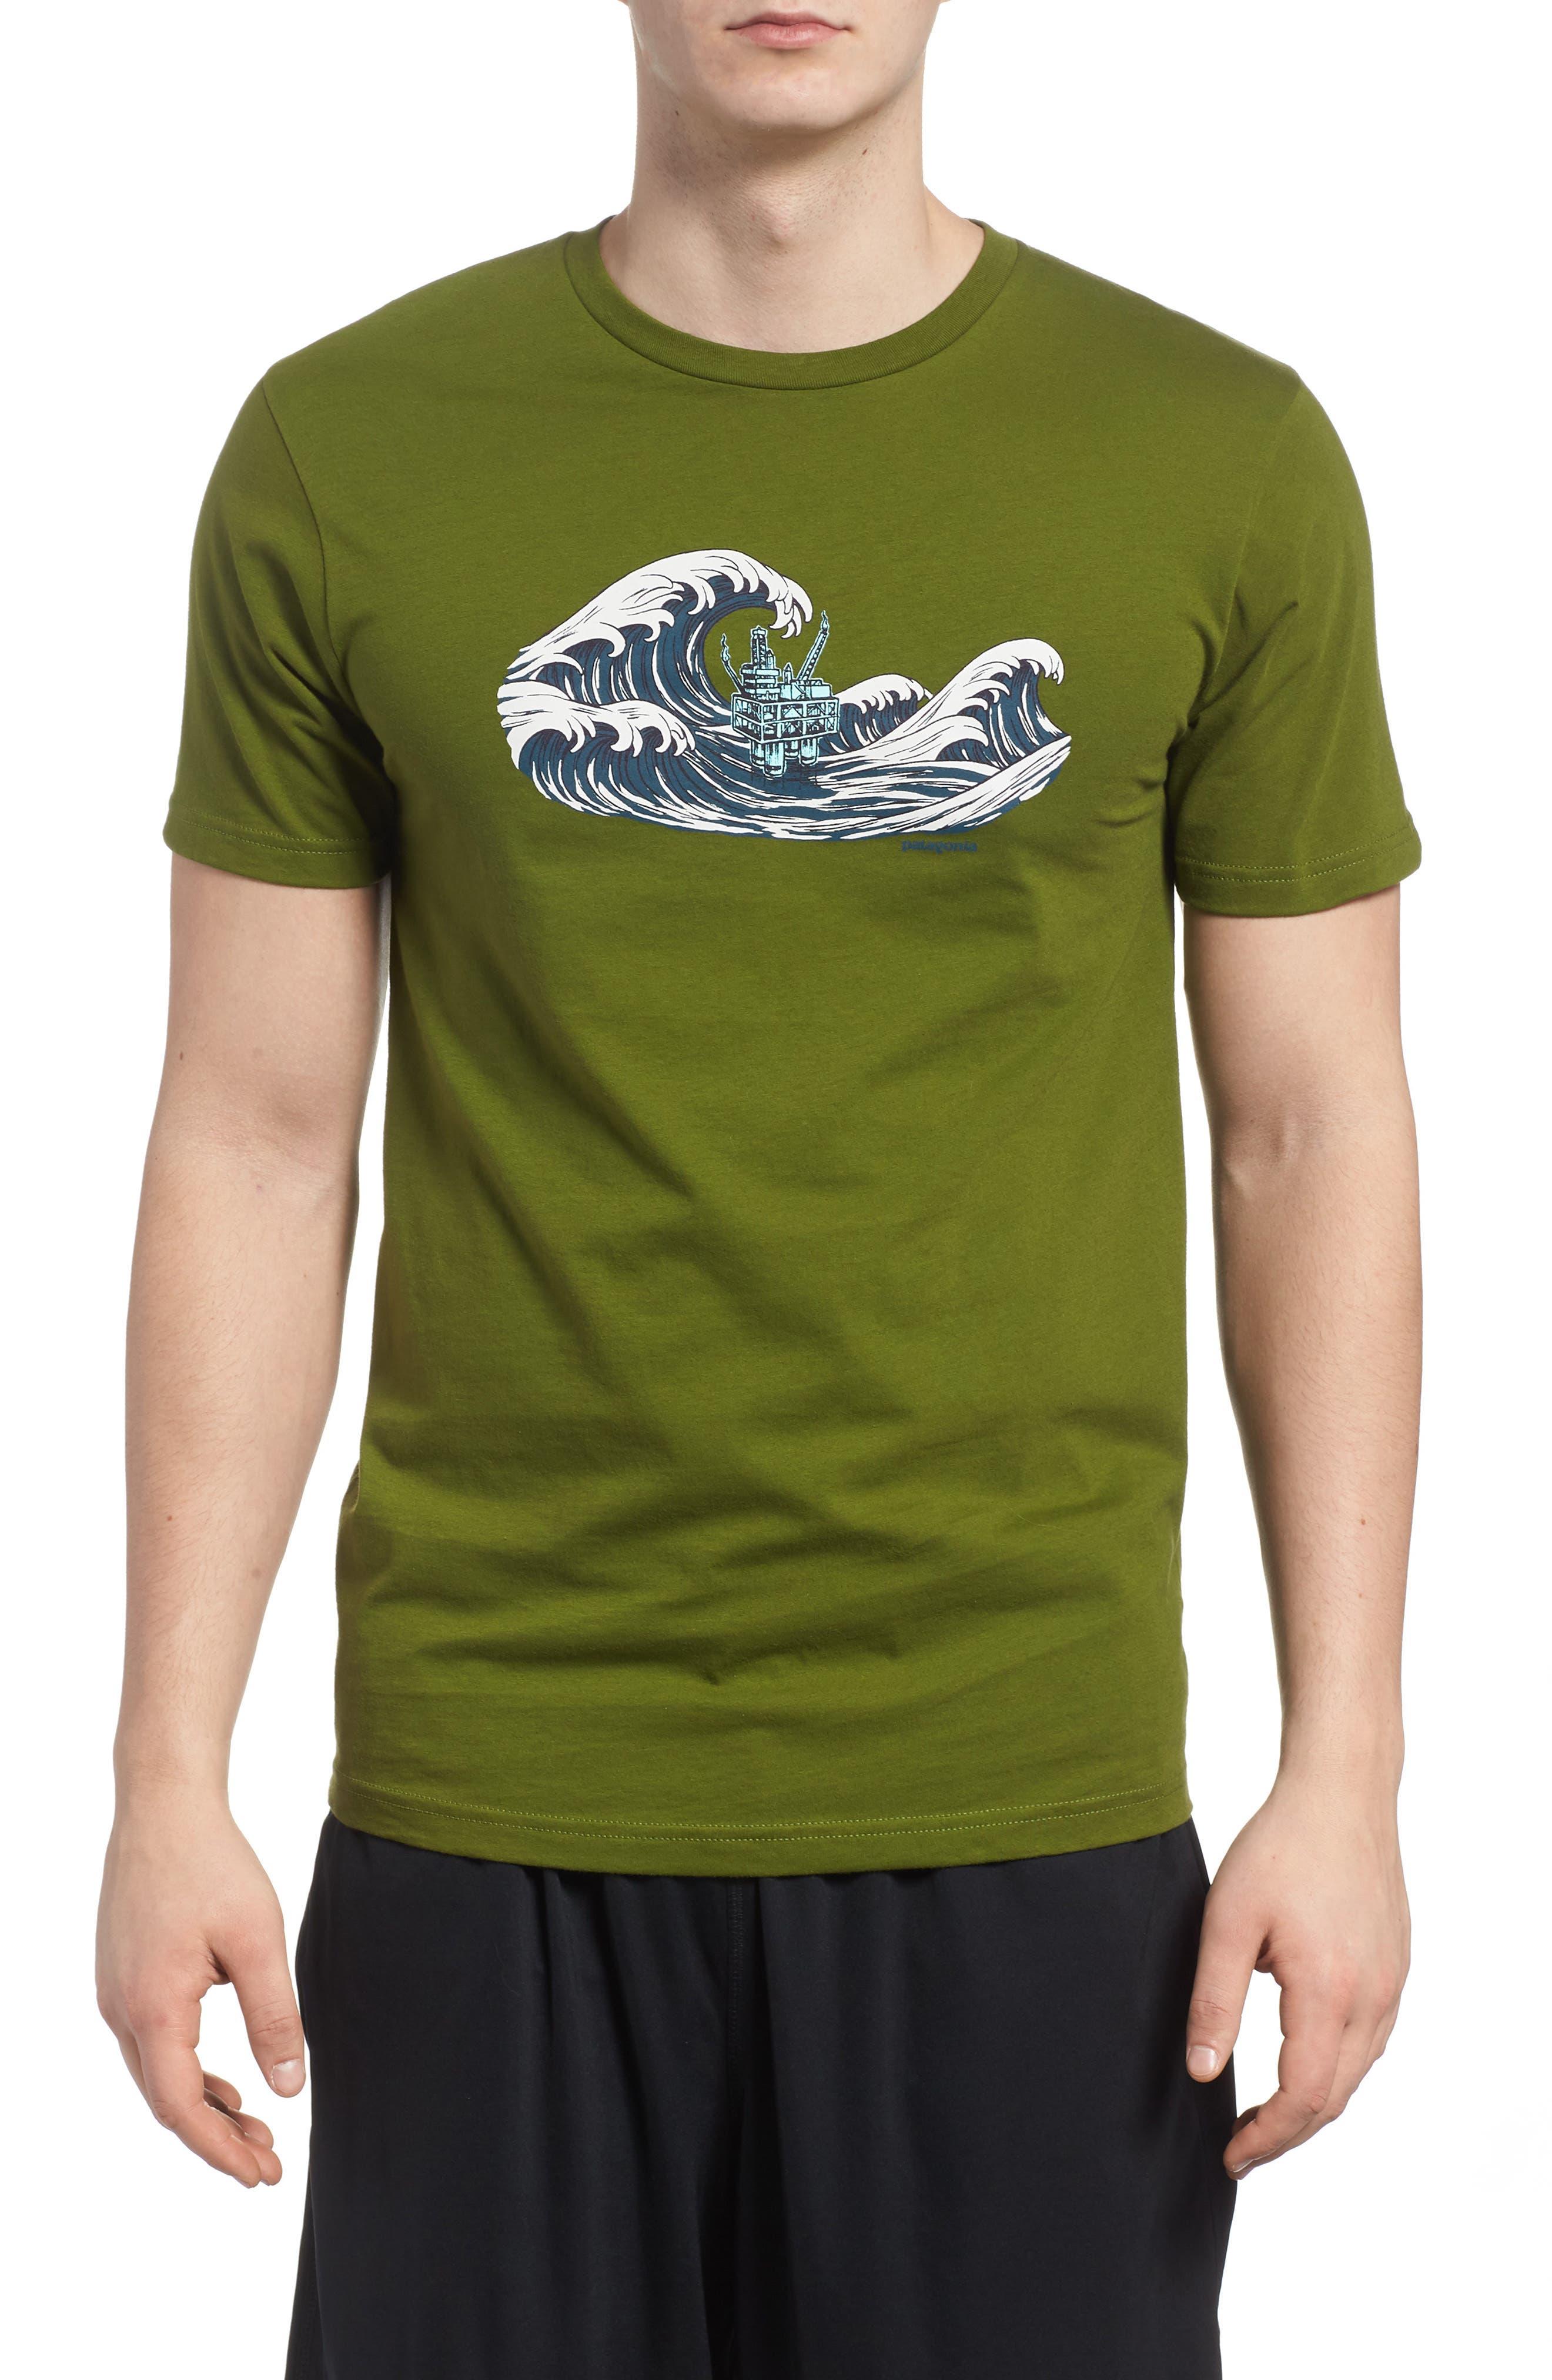 PATAGONIA,                             Oily Olas Slim Fit Organic Cotton T-Shirt,                             Main thumbnail 1, color,                             300